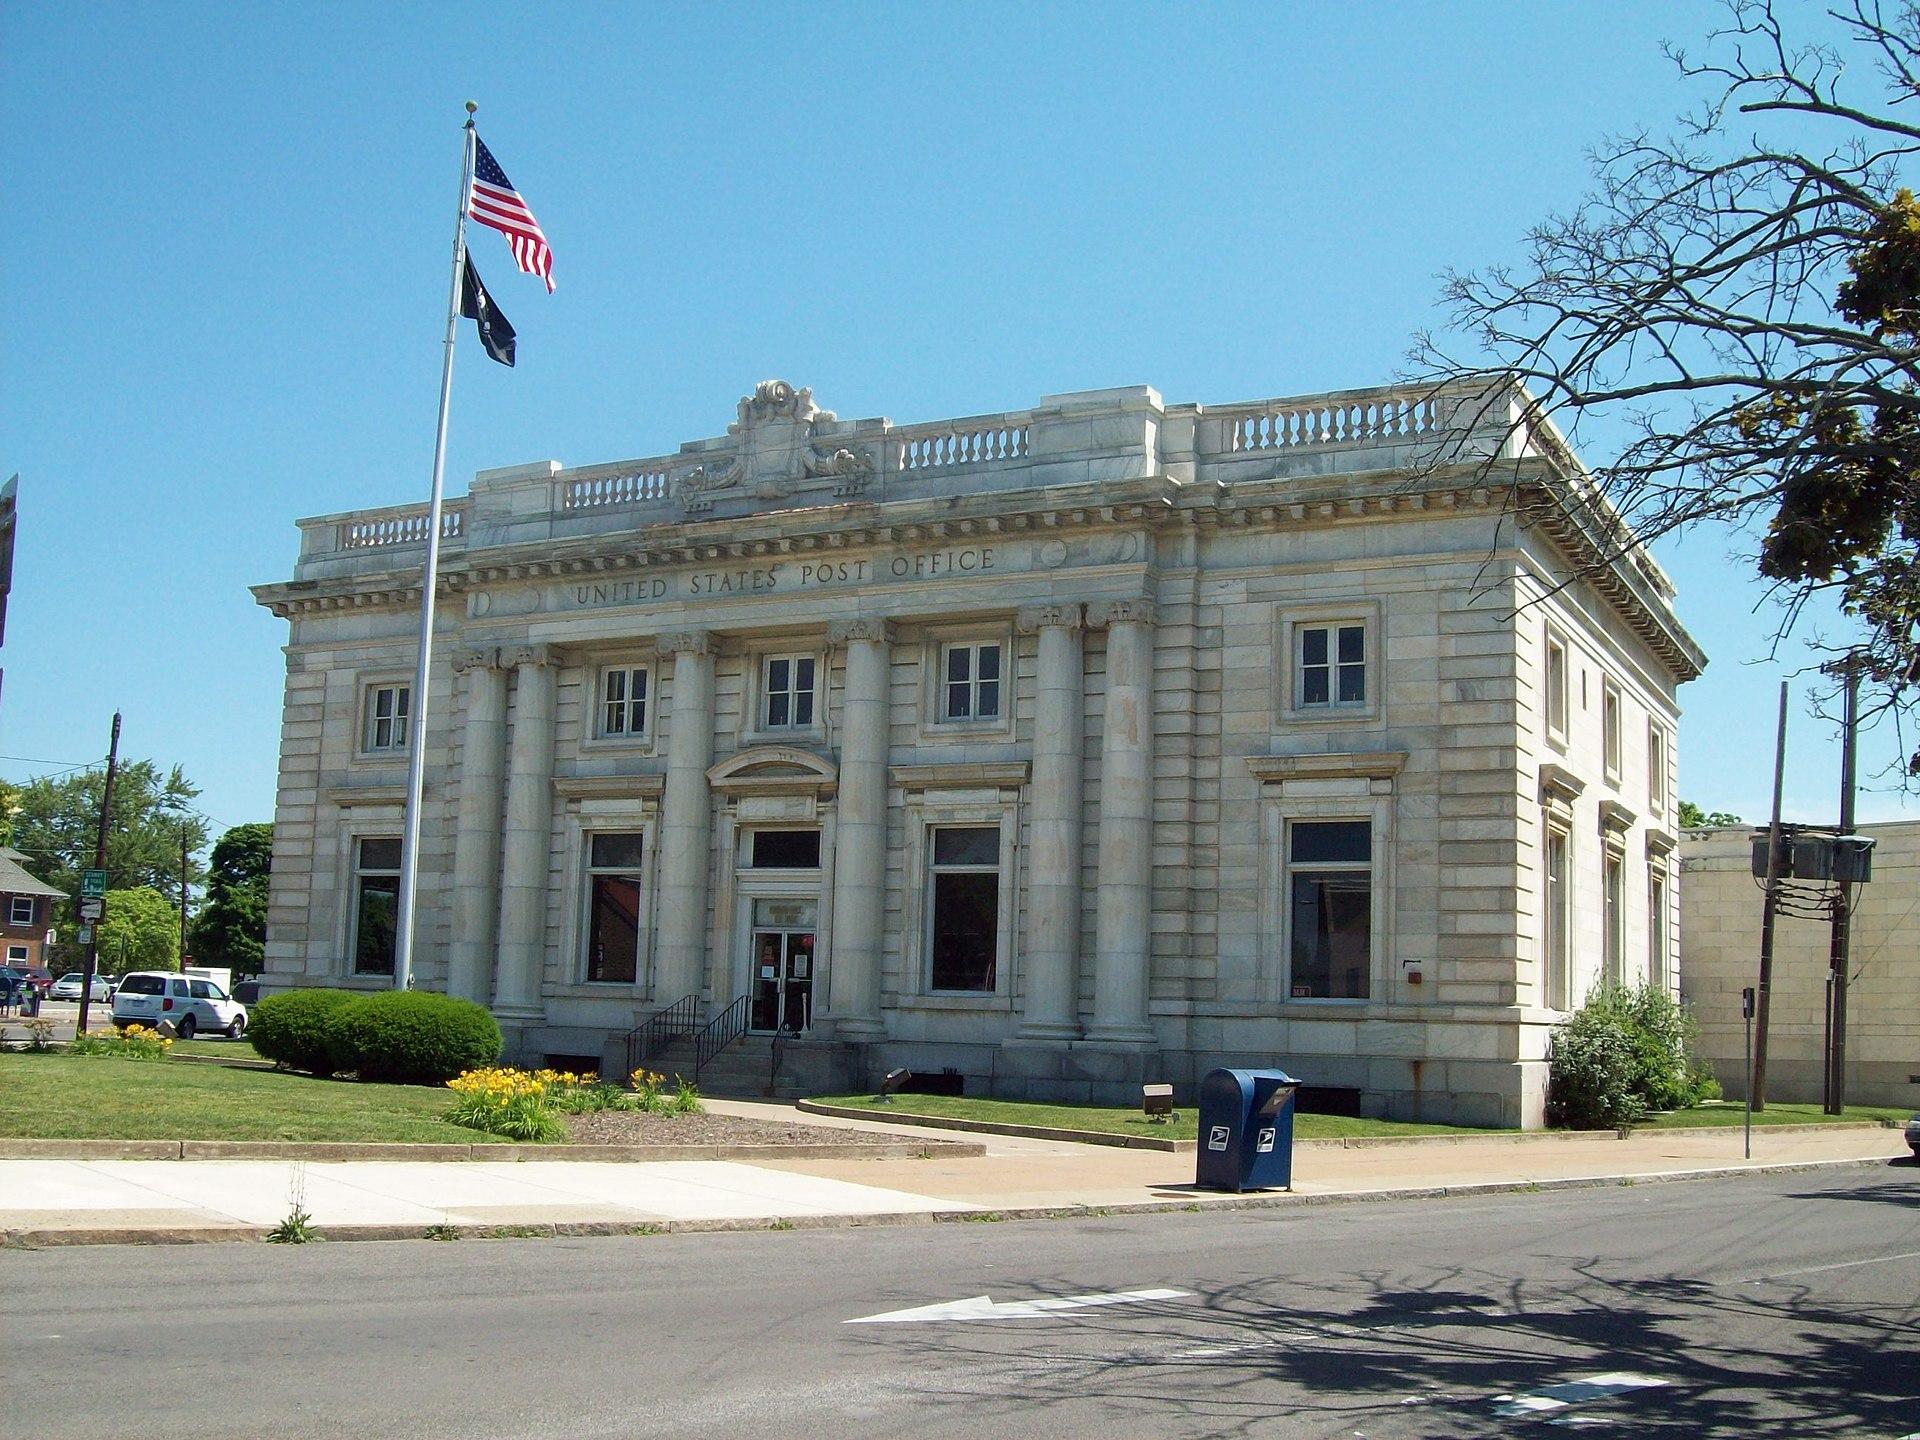 United states post office niagara falls new york wikipedia - United states post office ...